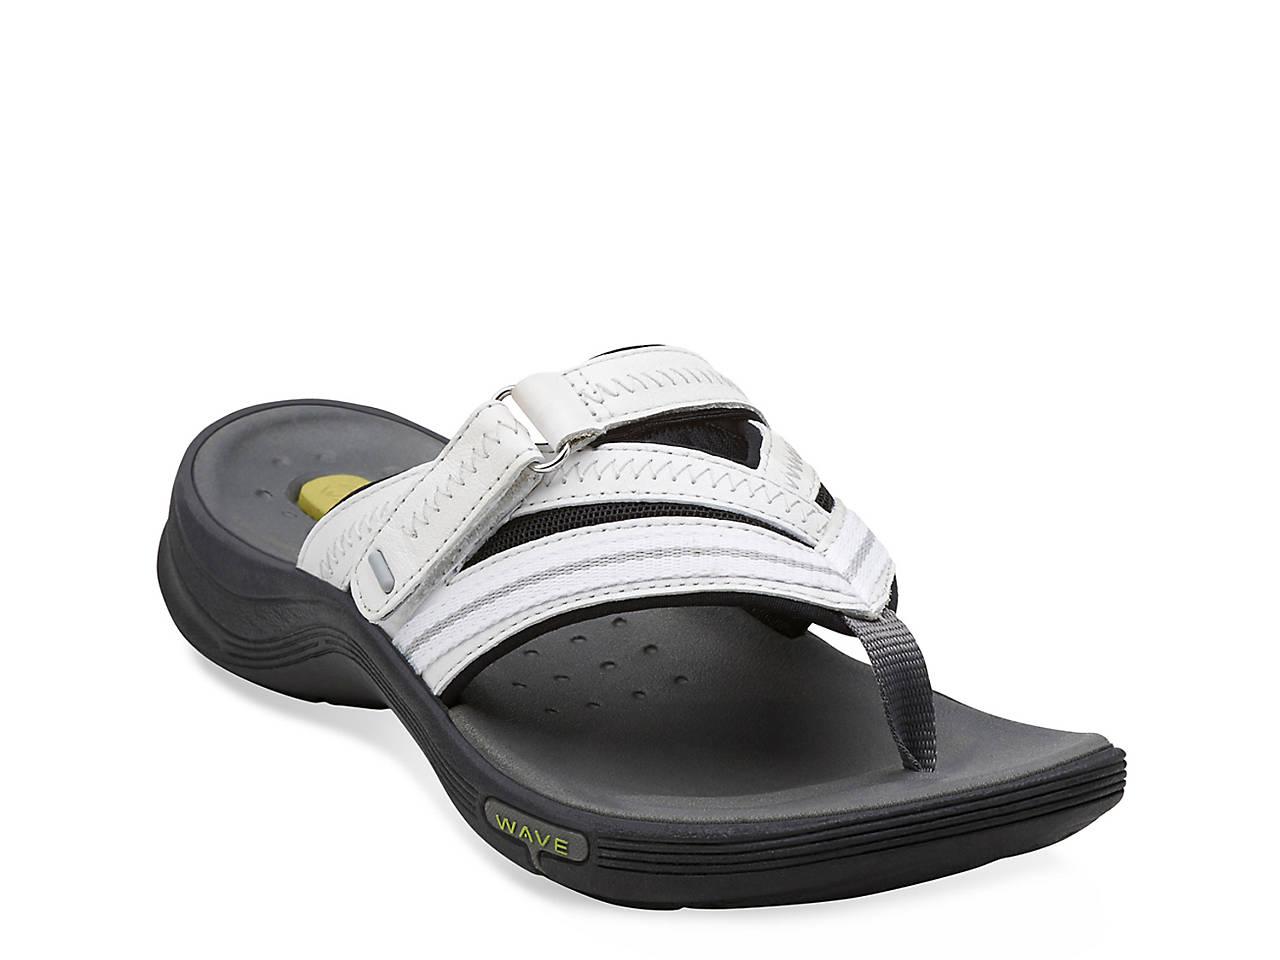 bf75e988191b Clarks Wave Coast Sandal Women s Shoes